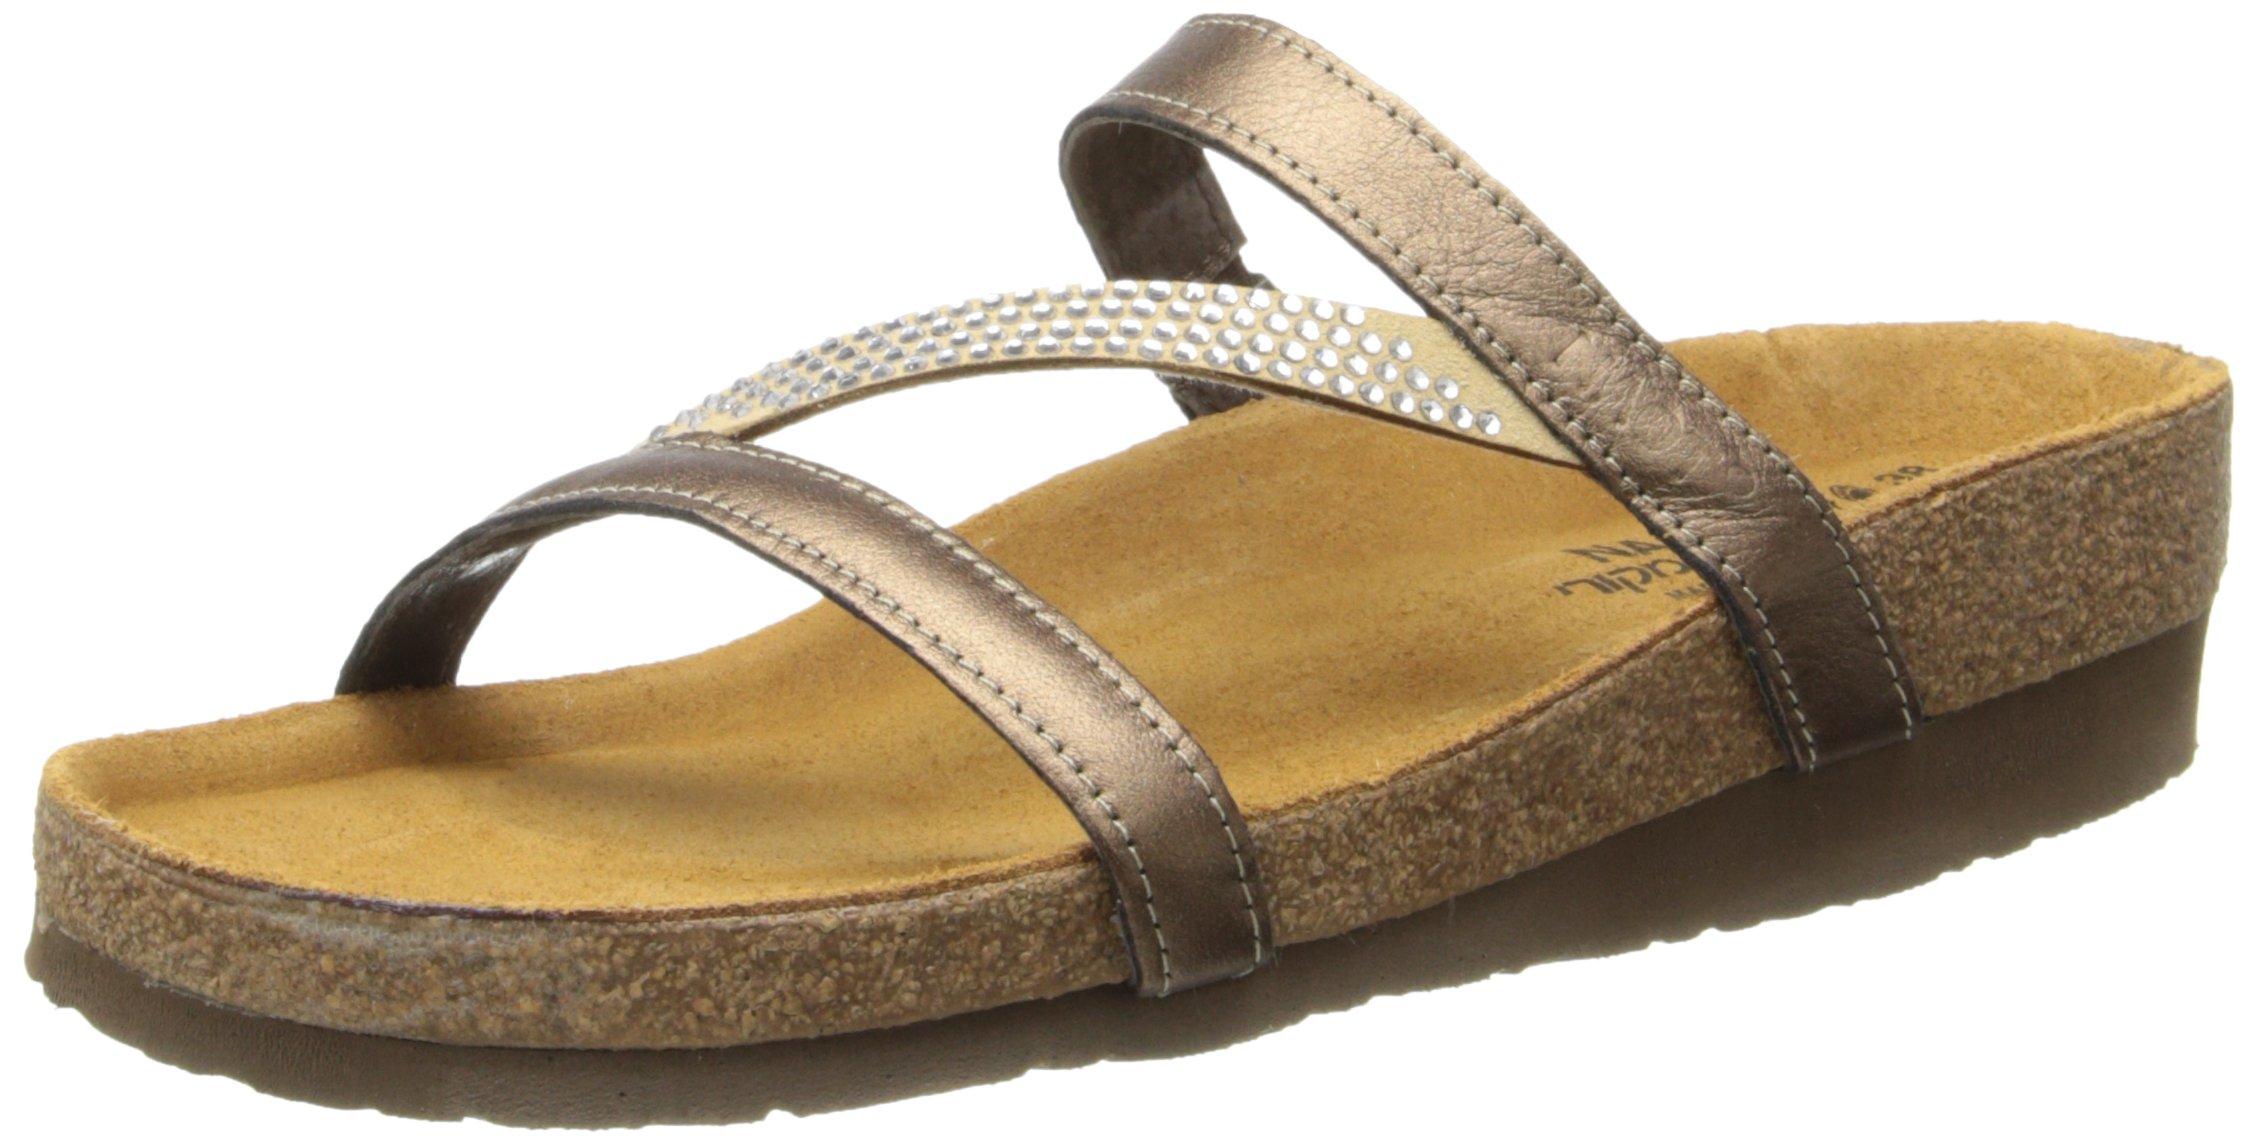 Naot Women's Hawaii Wedge Sandal, Grecian Gold Leather, 39 EU/7.5-8 M US by NAOT